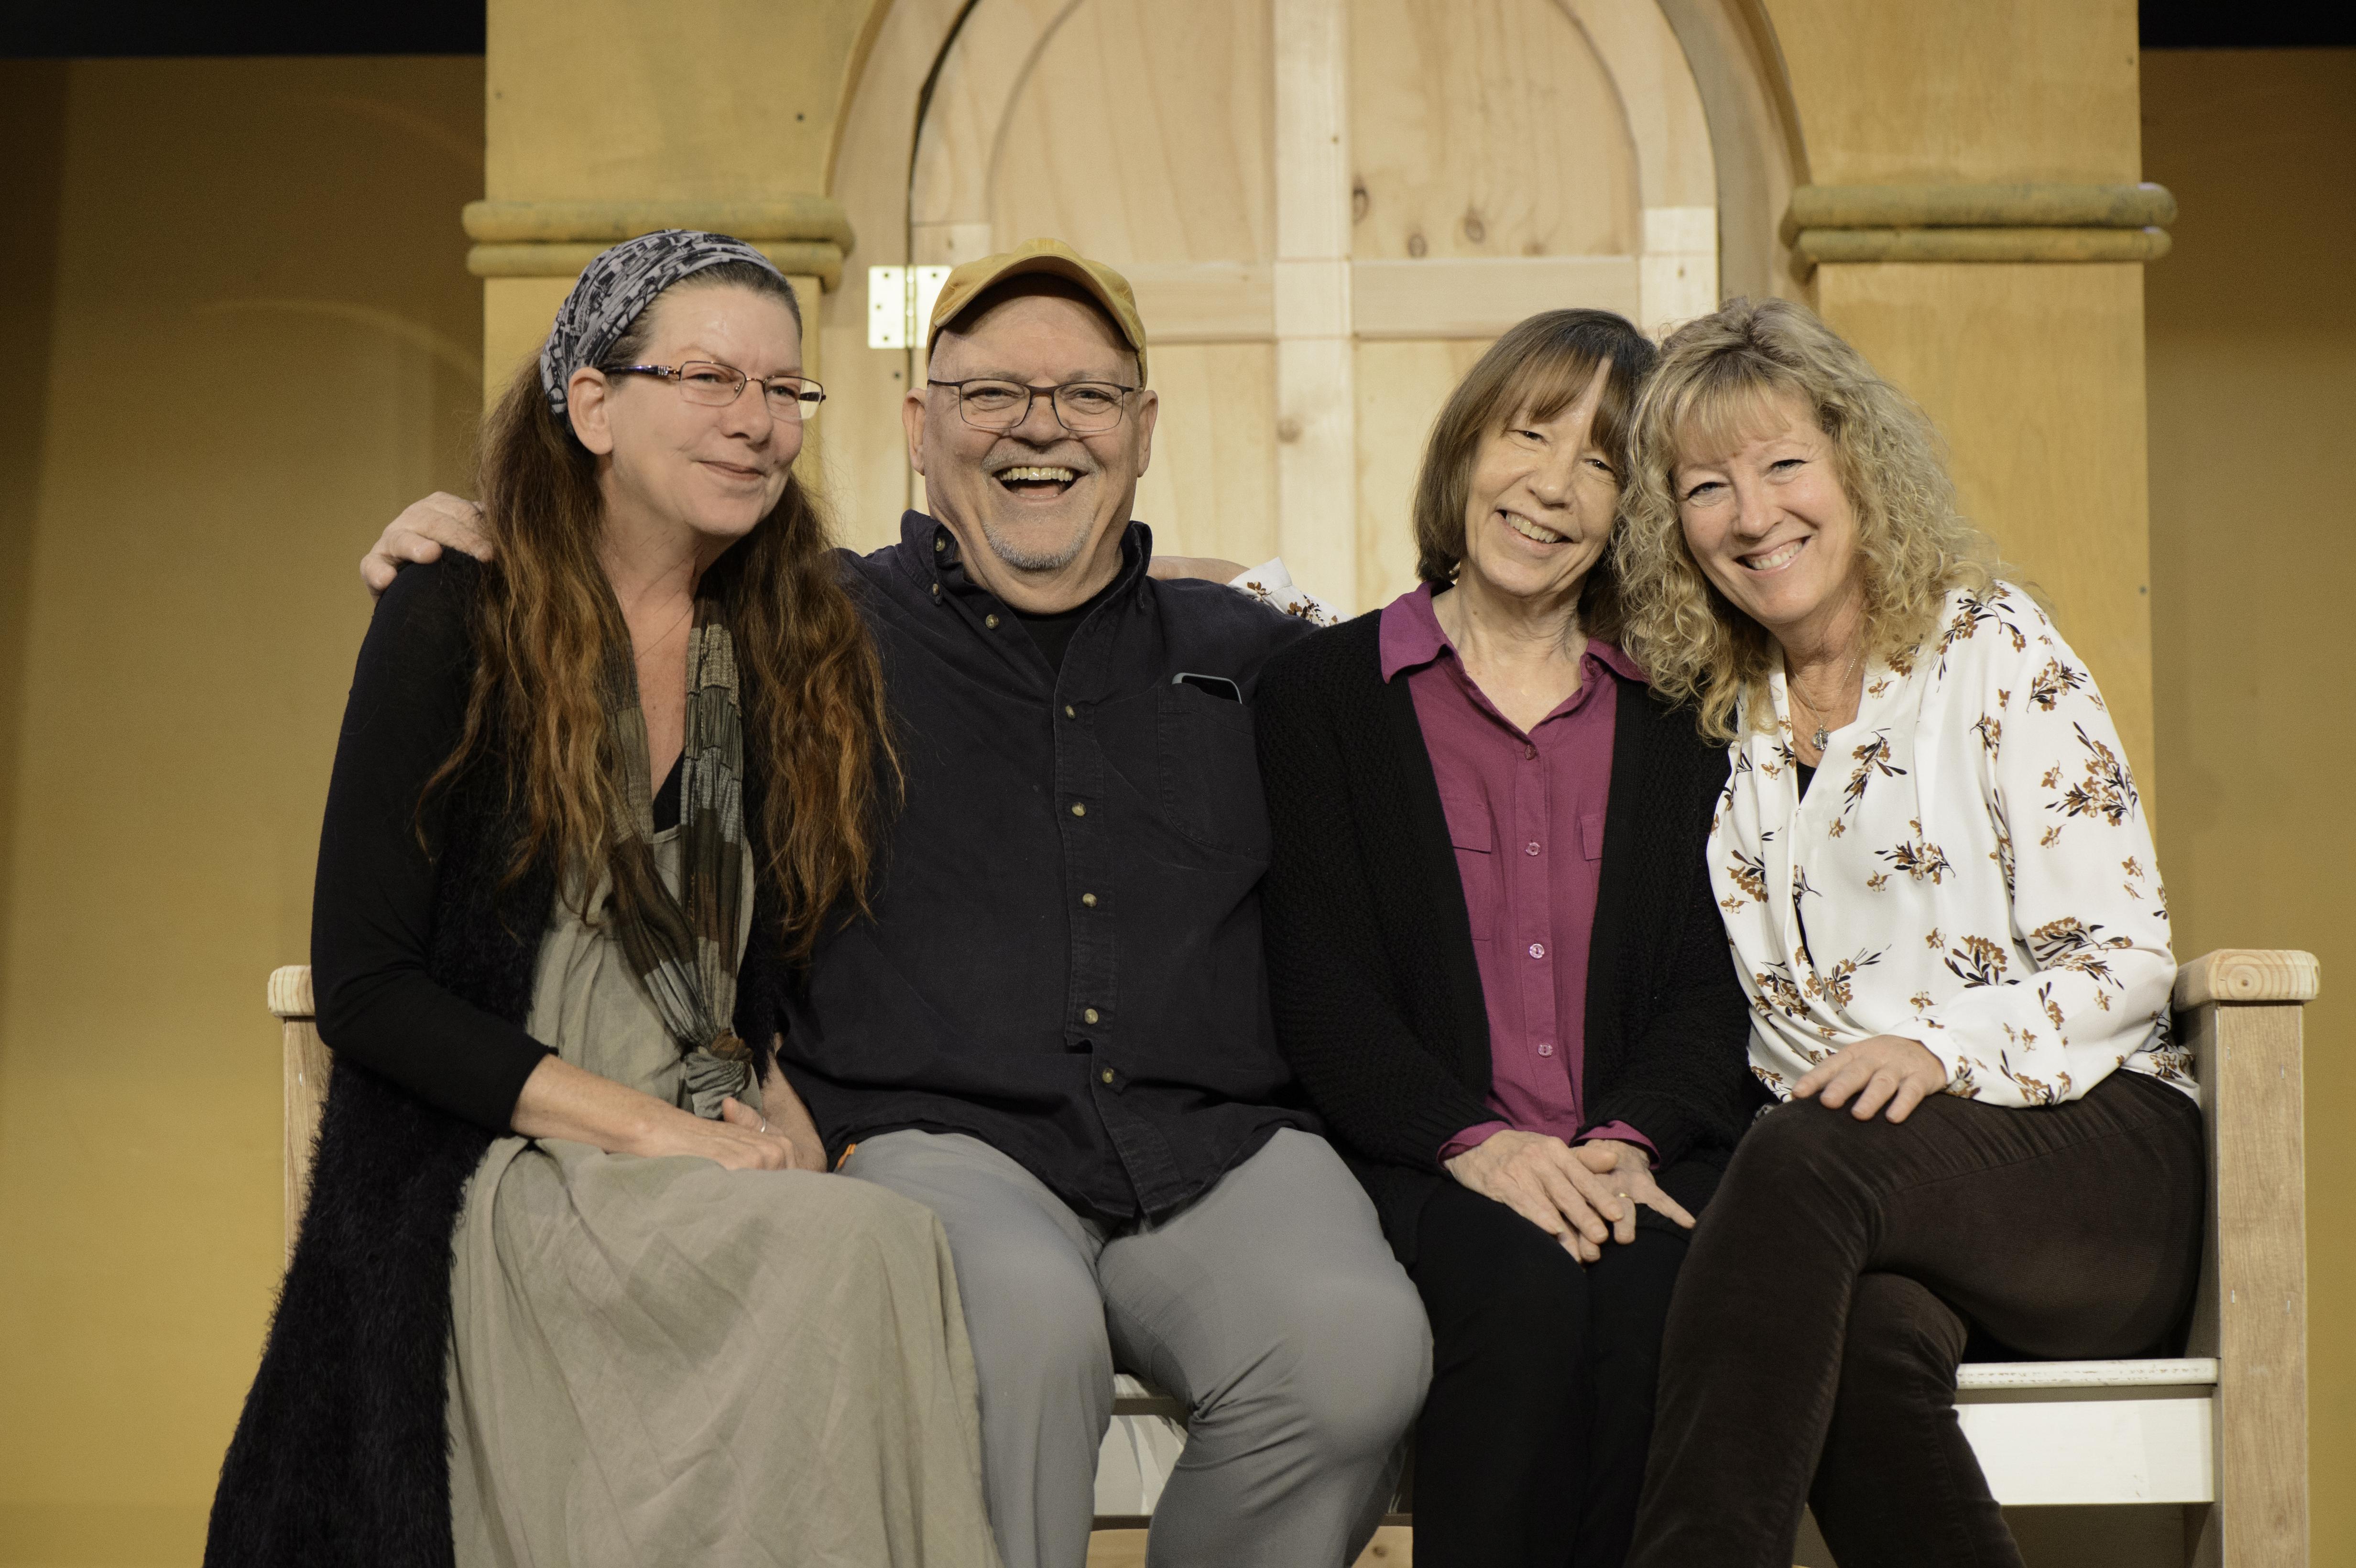 Jaye Hersh, Dr. Marty Babyco, Janet McNeil and Katherine White